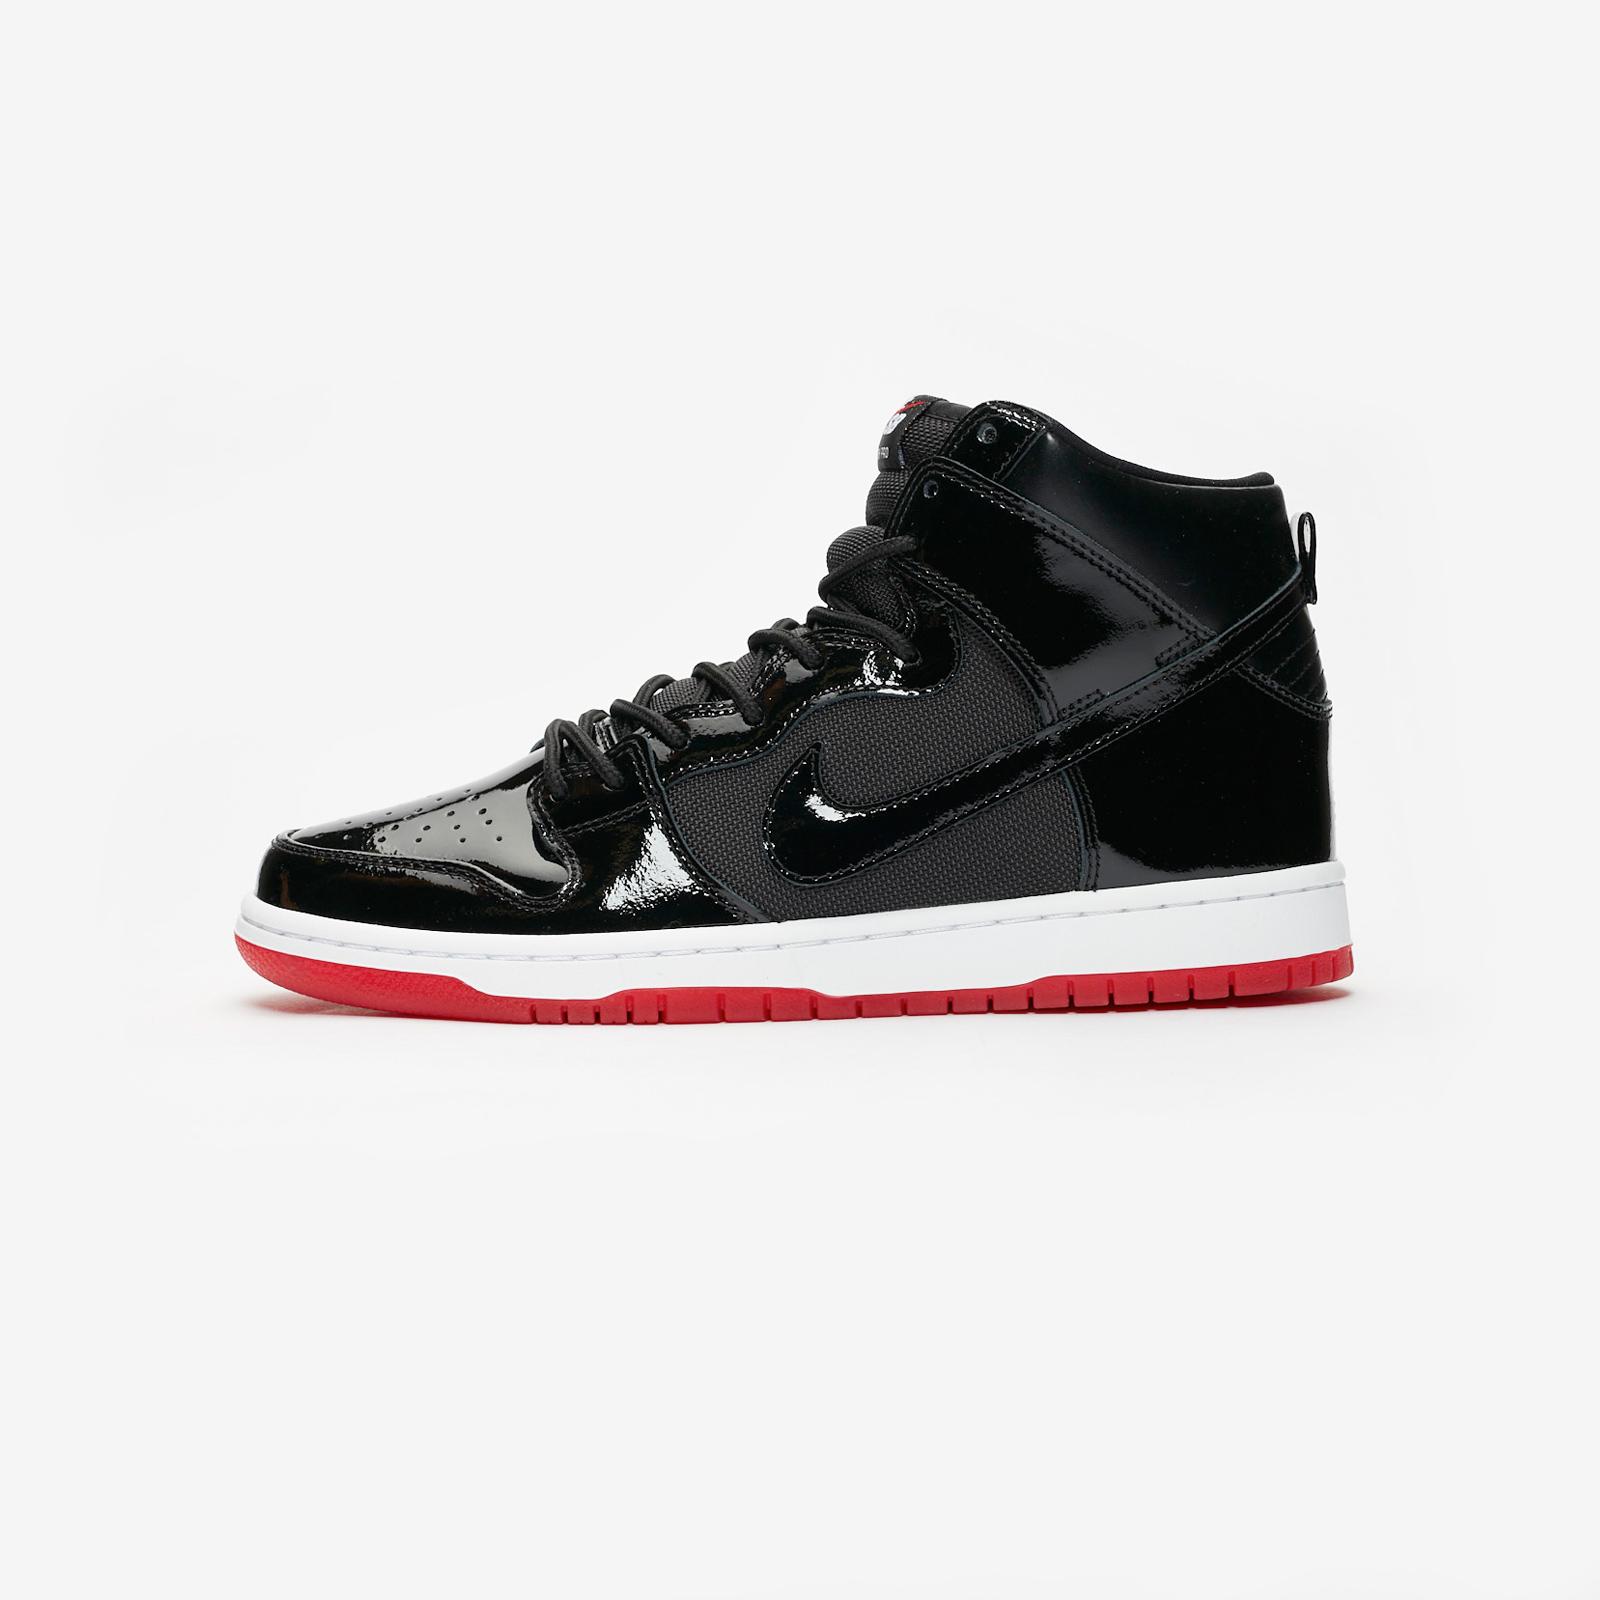 Nike Zoom Dunk SB High TR QS - Aj7730-001 - Sneakersnstuff ... 90fb531c4